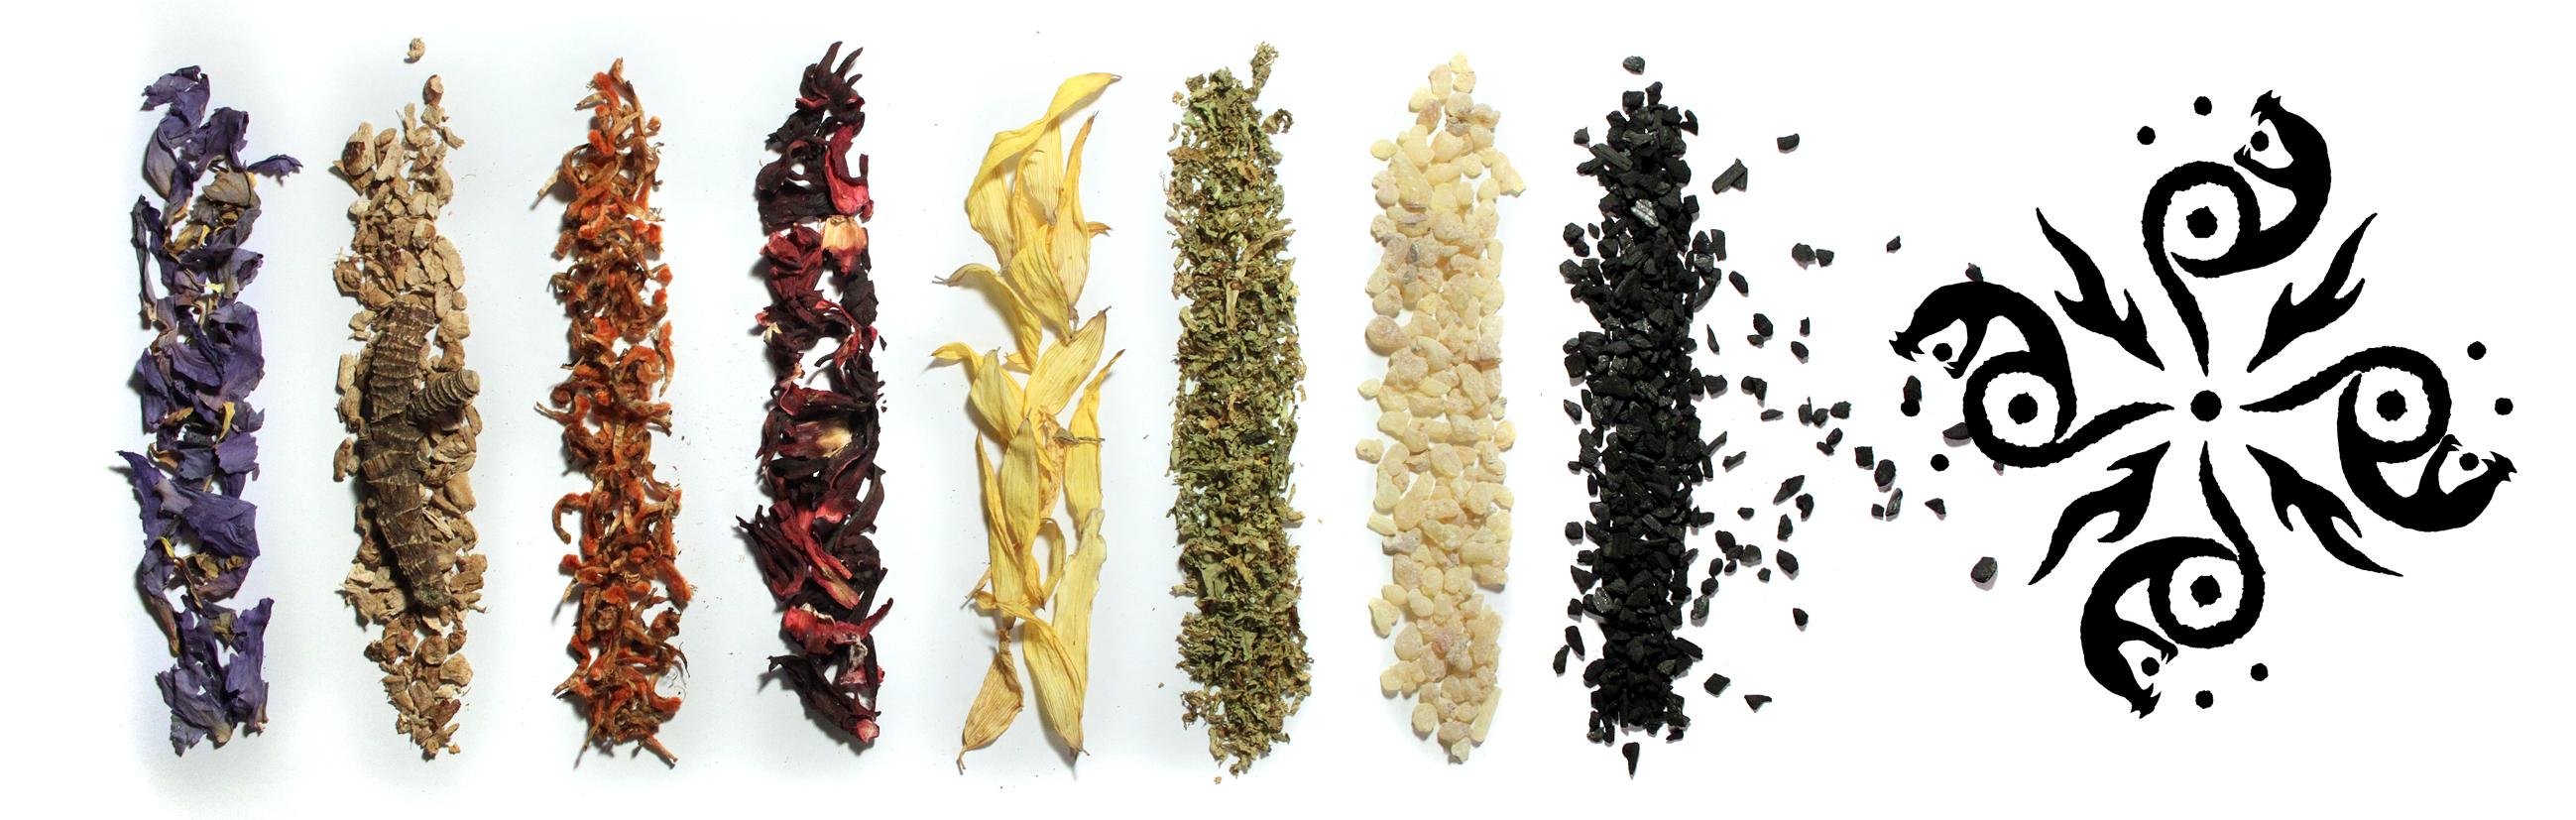 Thagirion Herbs, Jan. 2017